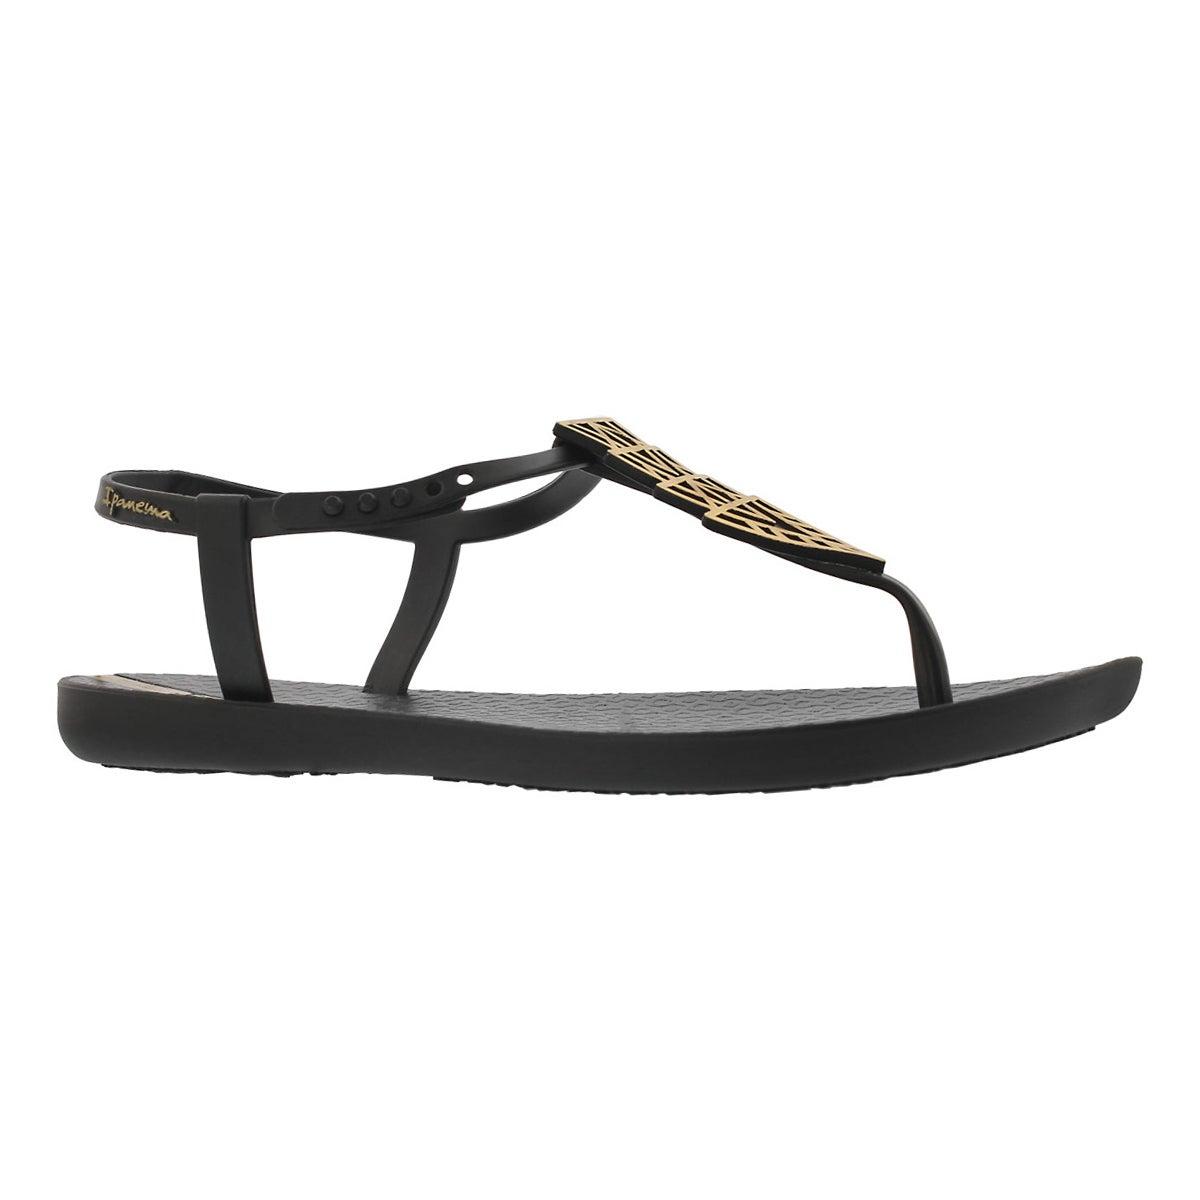 Lds Charm IV Sand blk/gld t-strap sandal